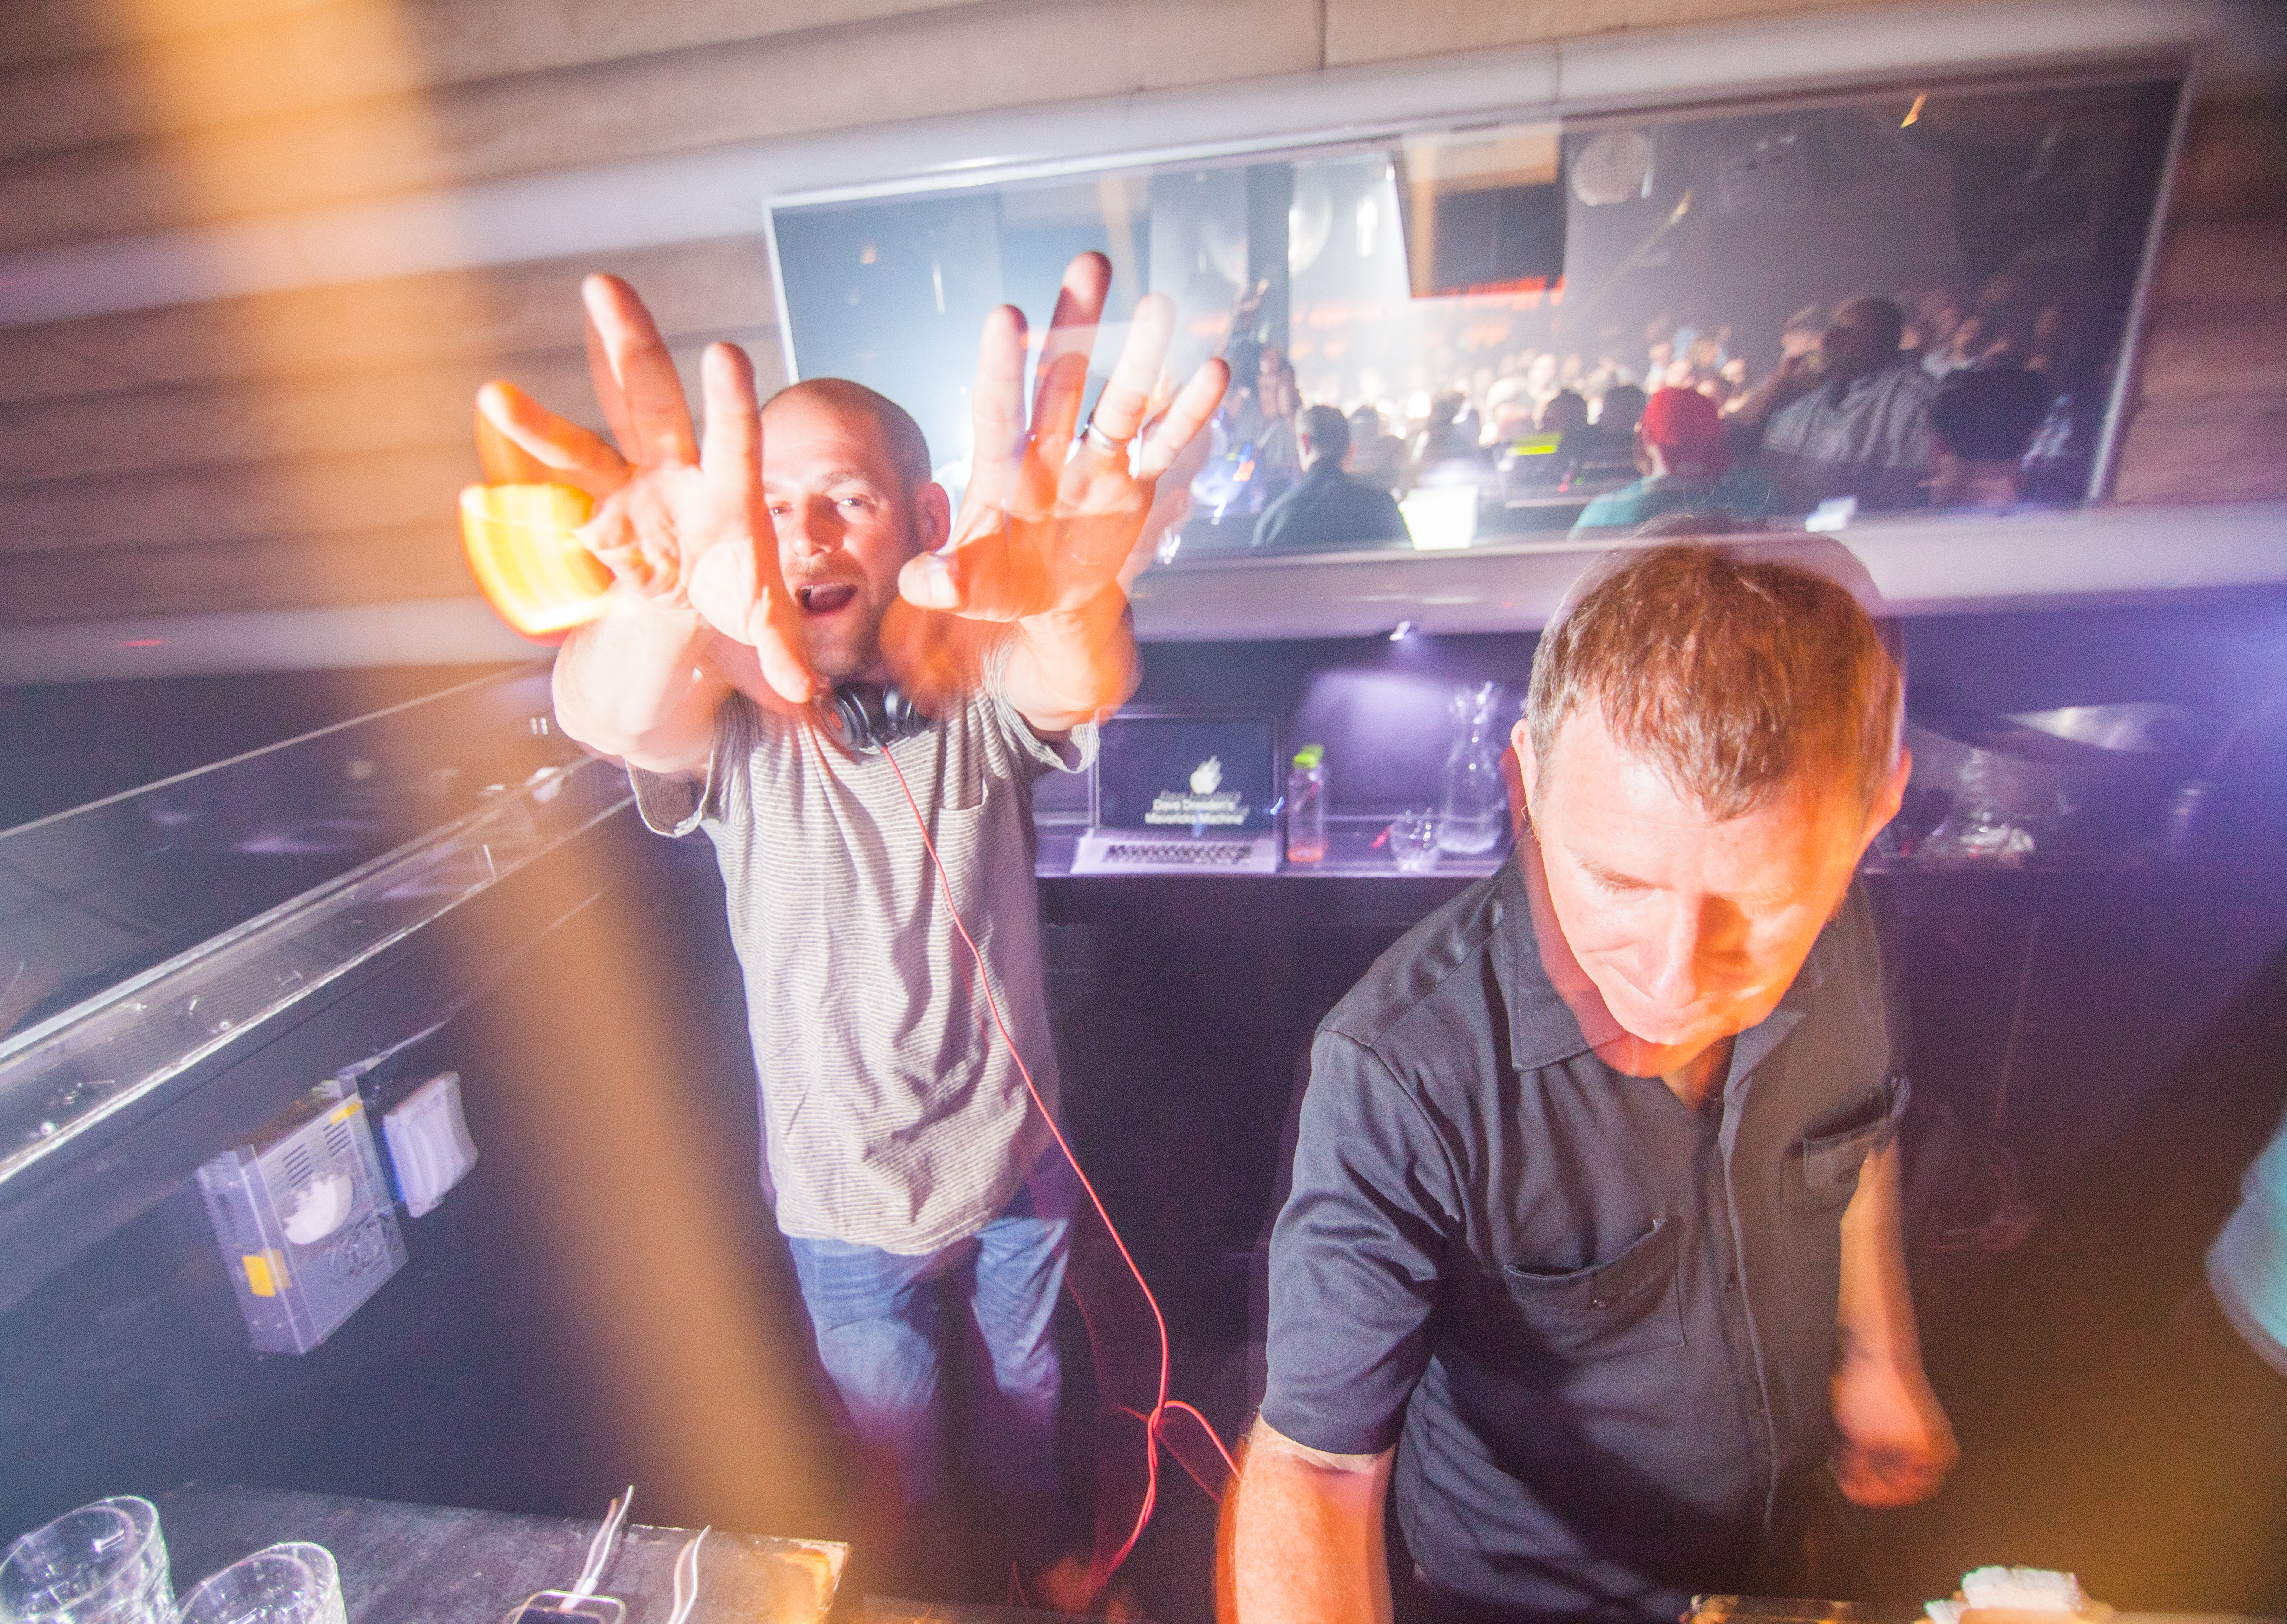 Gabriel & Dresden bring their classics to the Cielo crowd. | Photo: David Cova/Cova Images